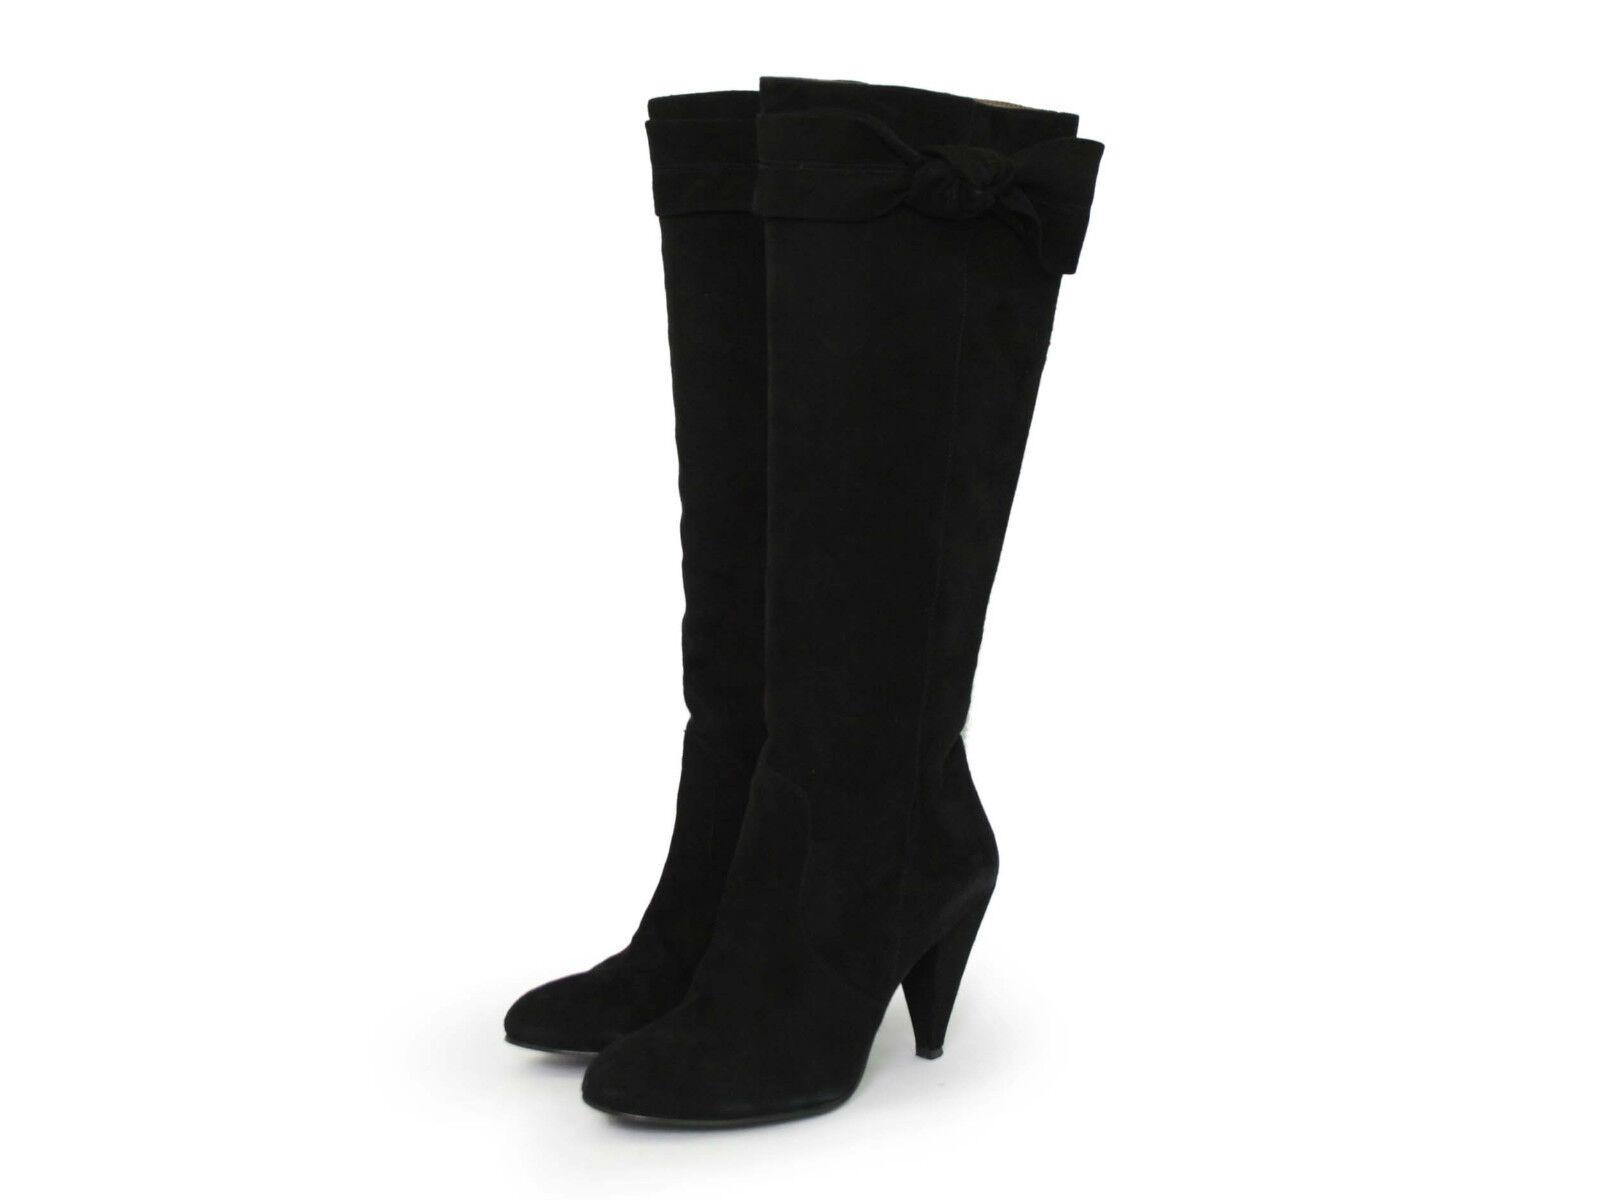 Alexandra Collezione Gr.39 Stiefel High Heels Veloursleder Gr.39 Collezione Schwarz Feminin TOP e374f4